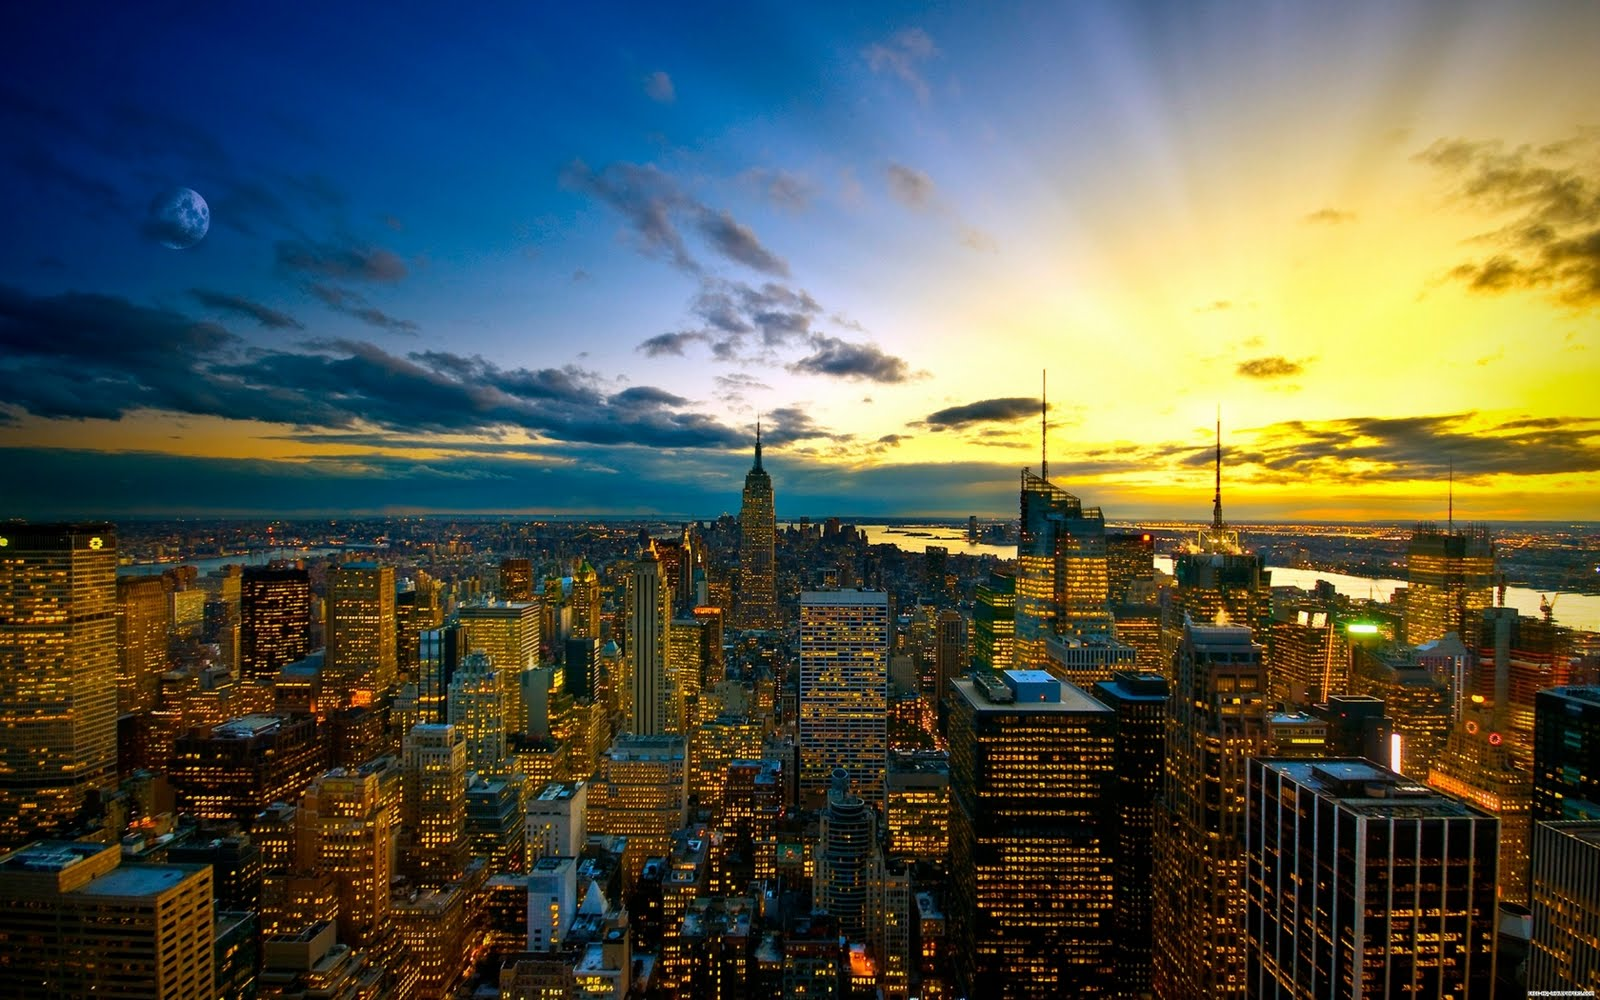 http://1.bp.blogspot.com/_2IU2Nt4rD1k/TFw_DPymMvI/AAAAAAAAB-c/8wwoclt7PcU/s1600/new_york_sunset.jpg